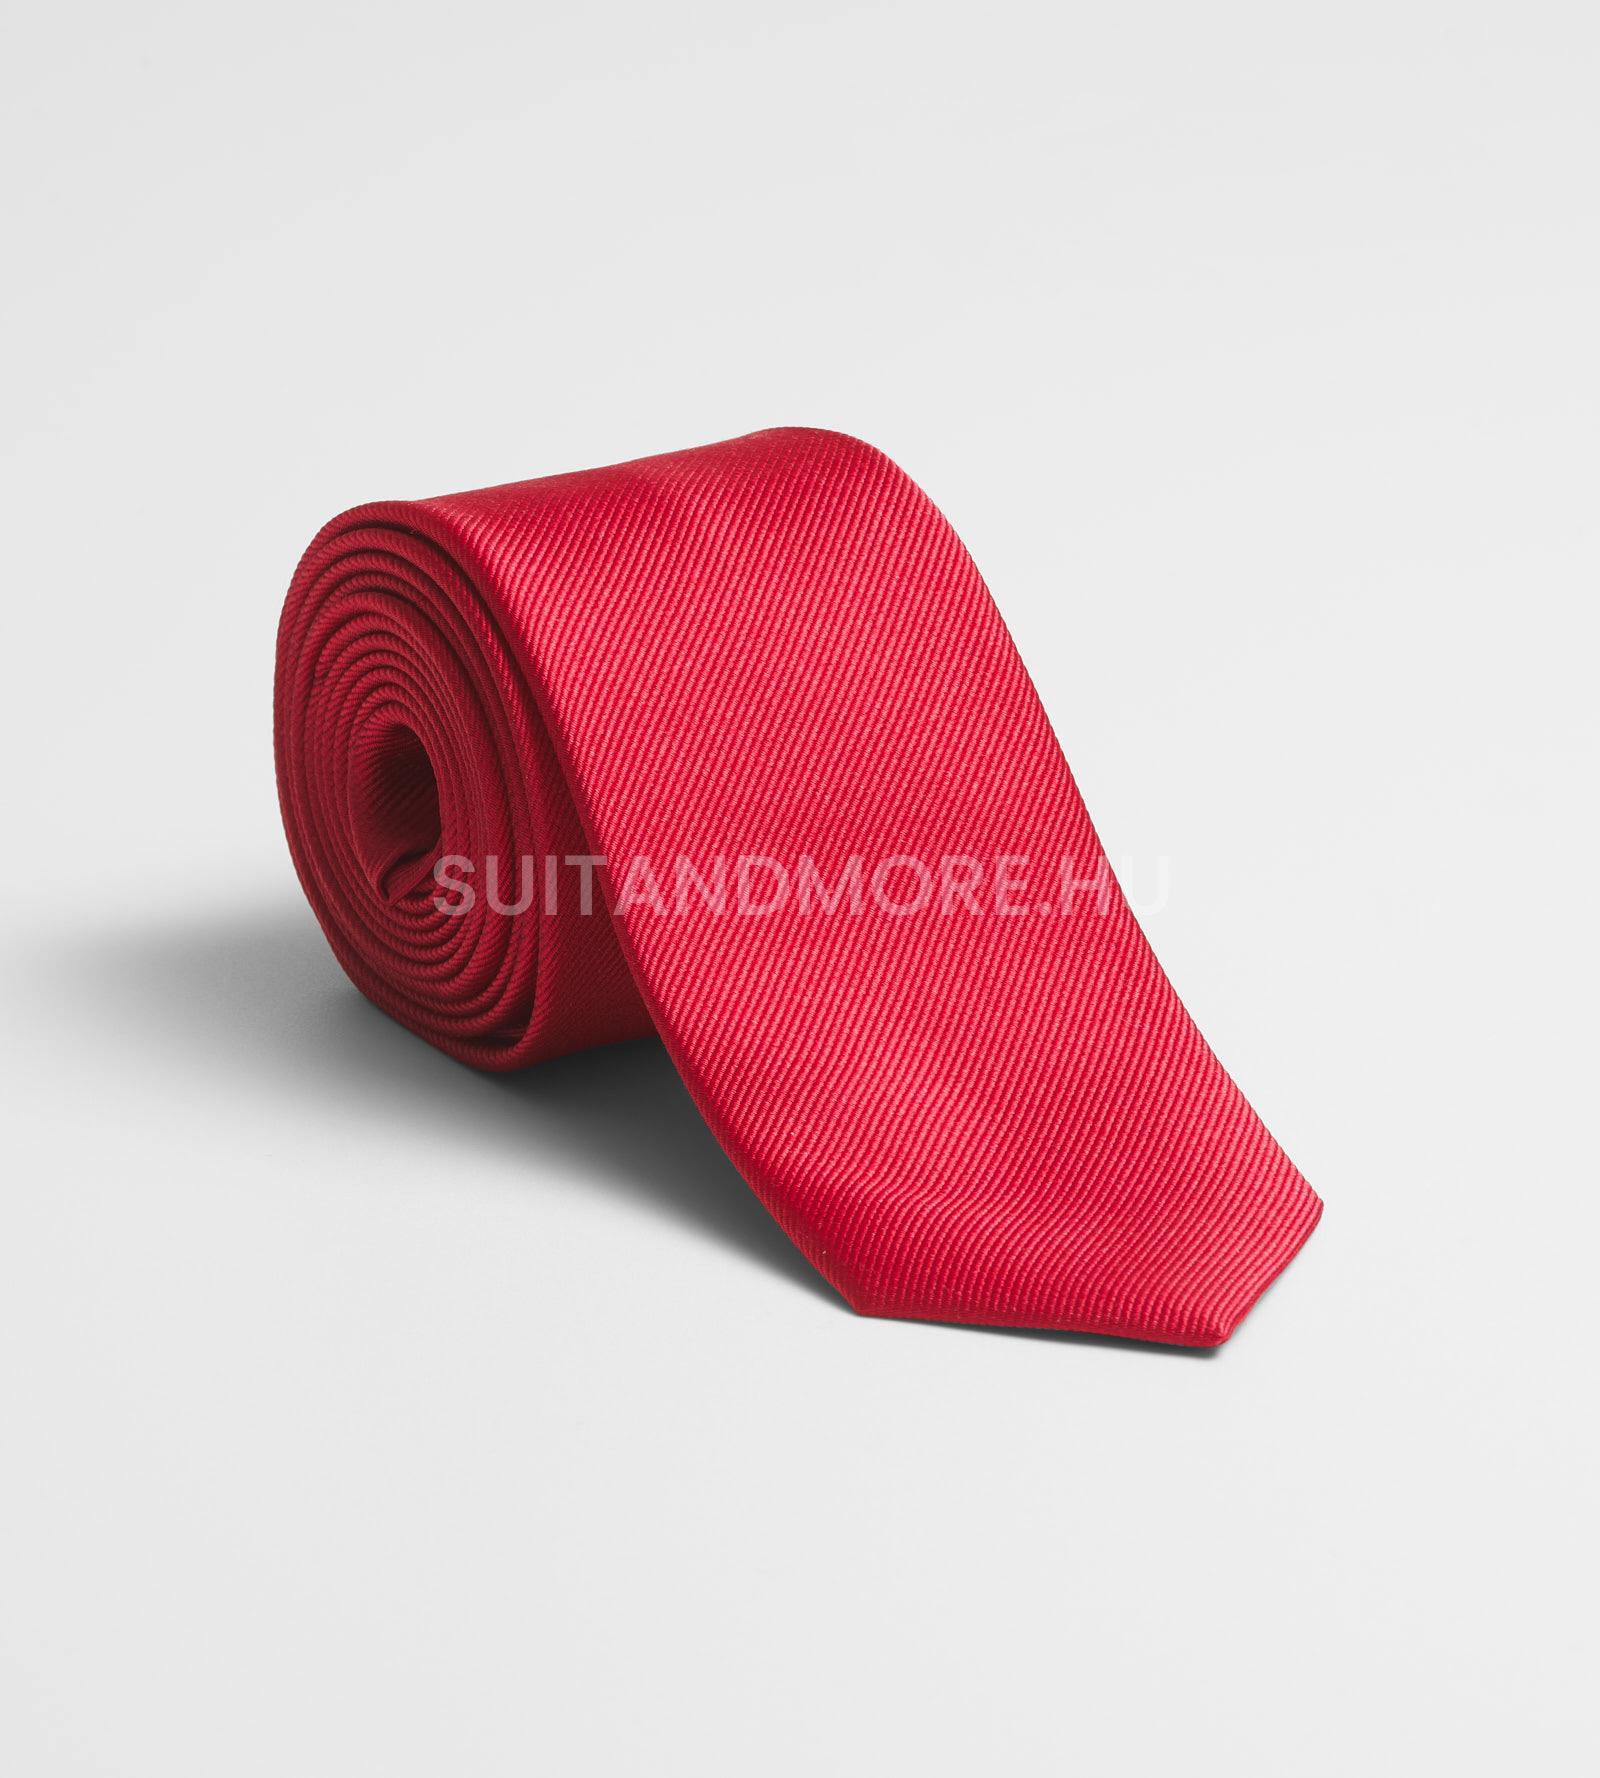 olymp-piros-strukturalt-selyem-nyakkendo-7696-00-36-01